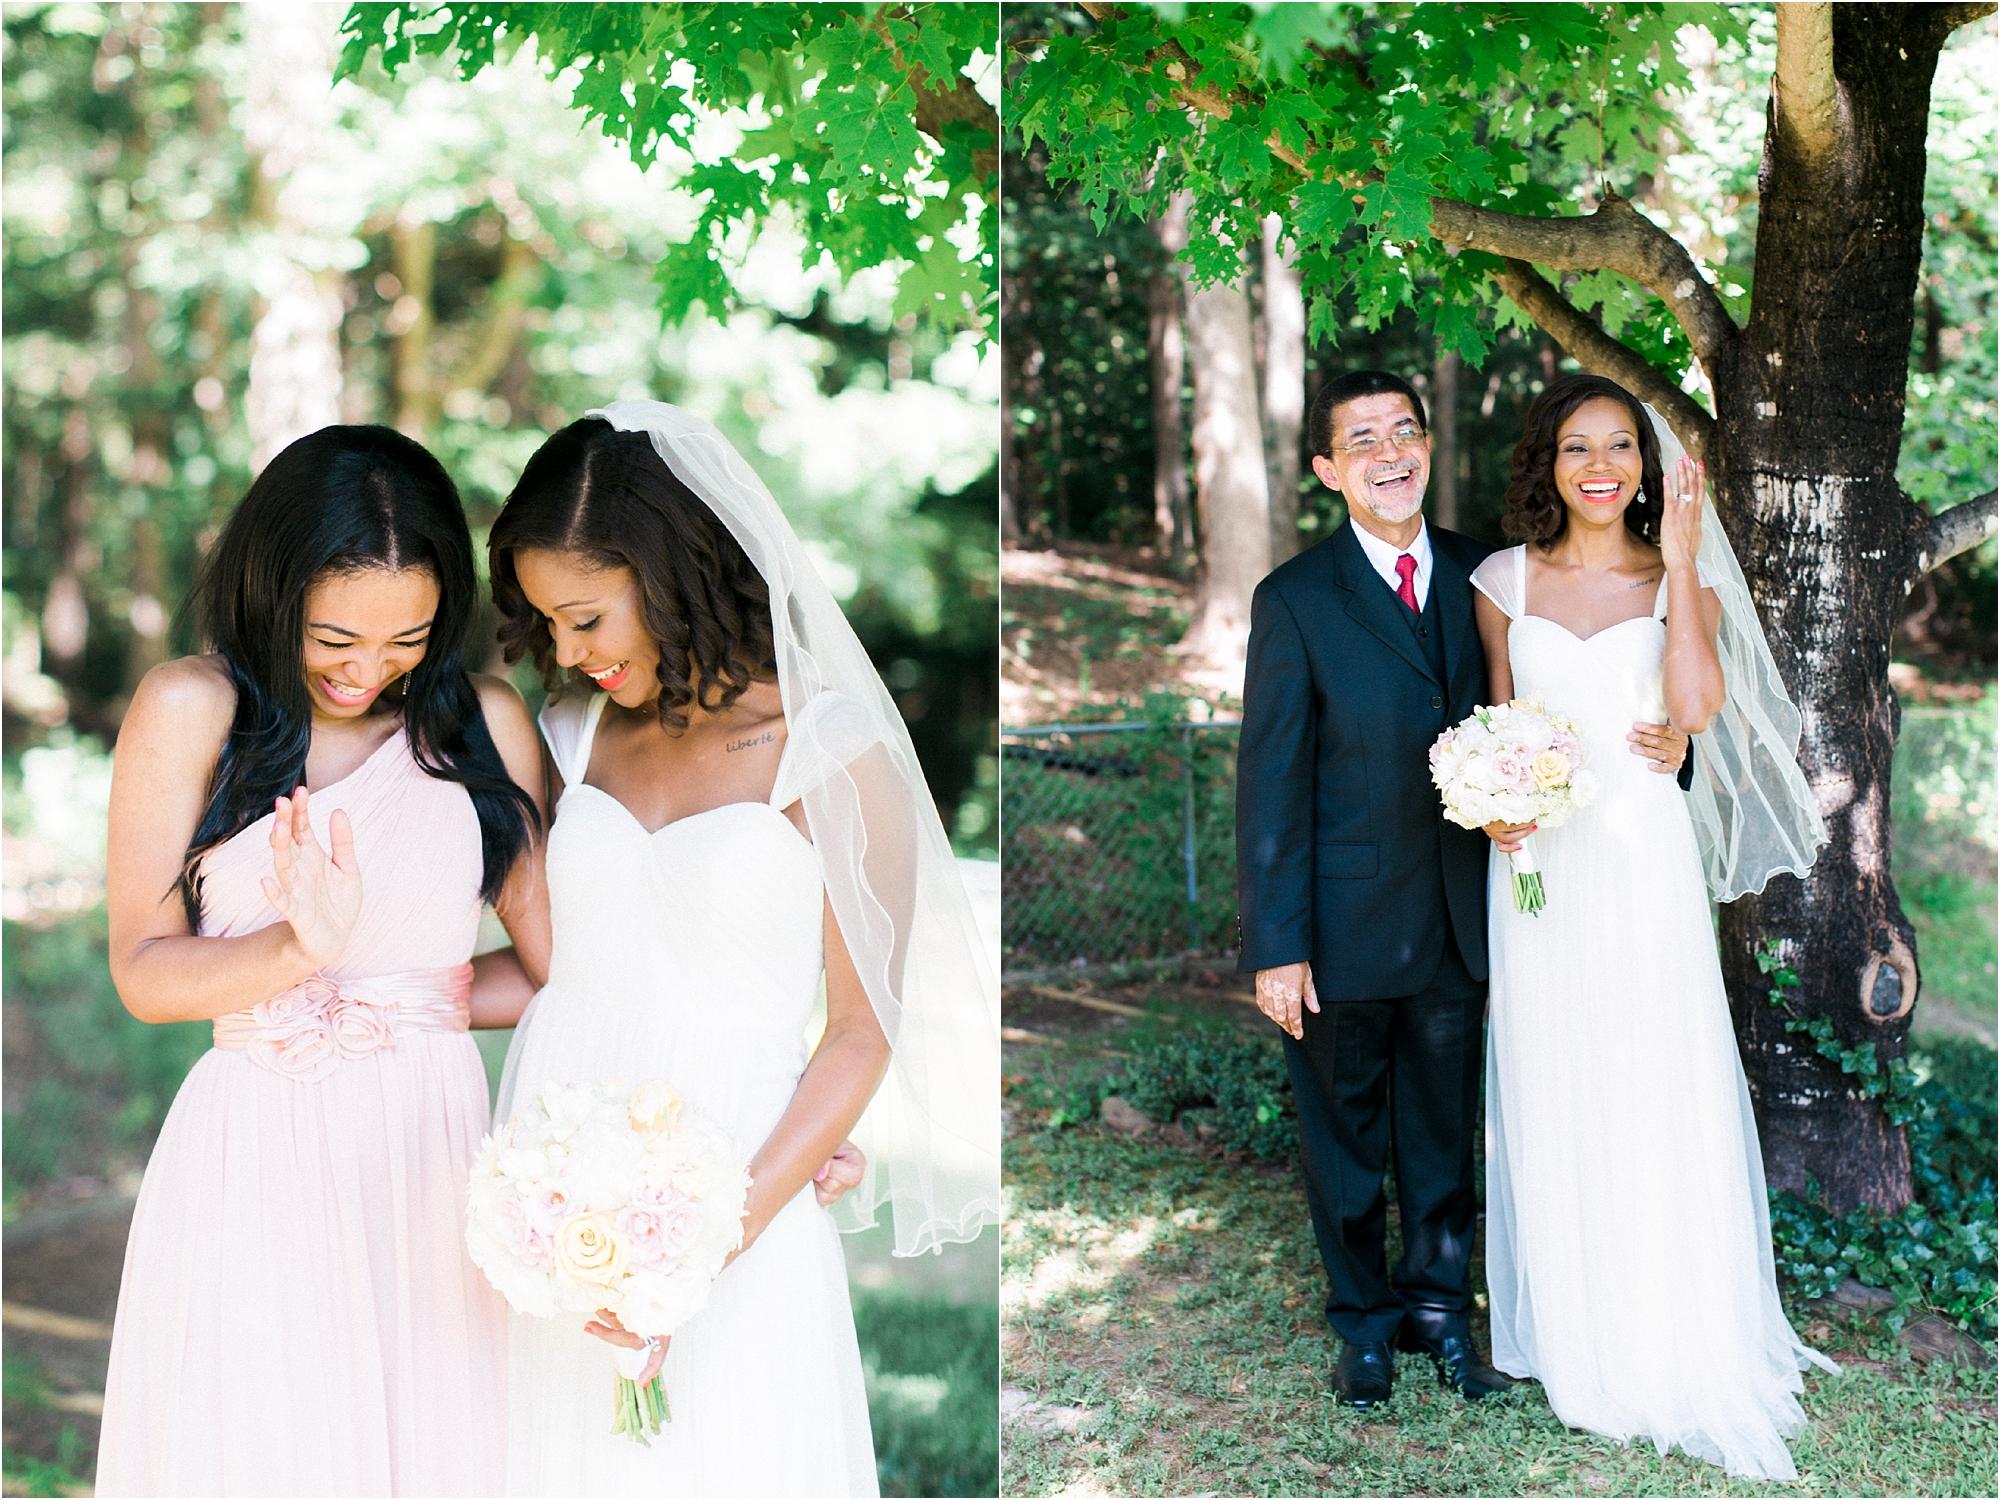 inimate-richmond-virginia-backyard-summer-wedding-photos_0013.jpg